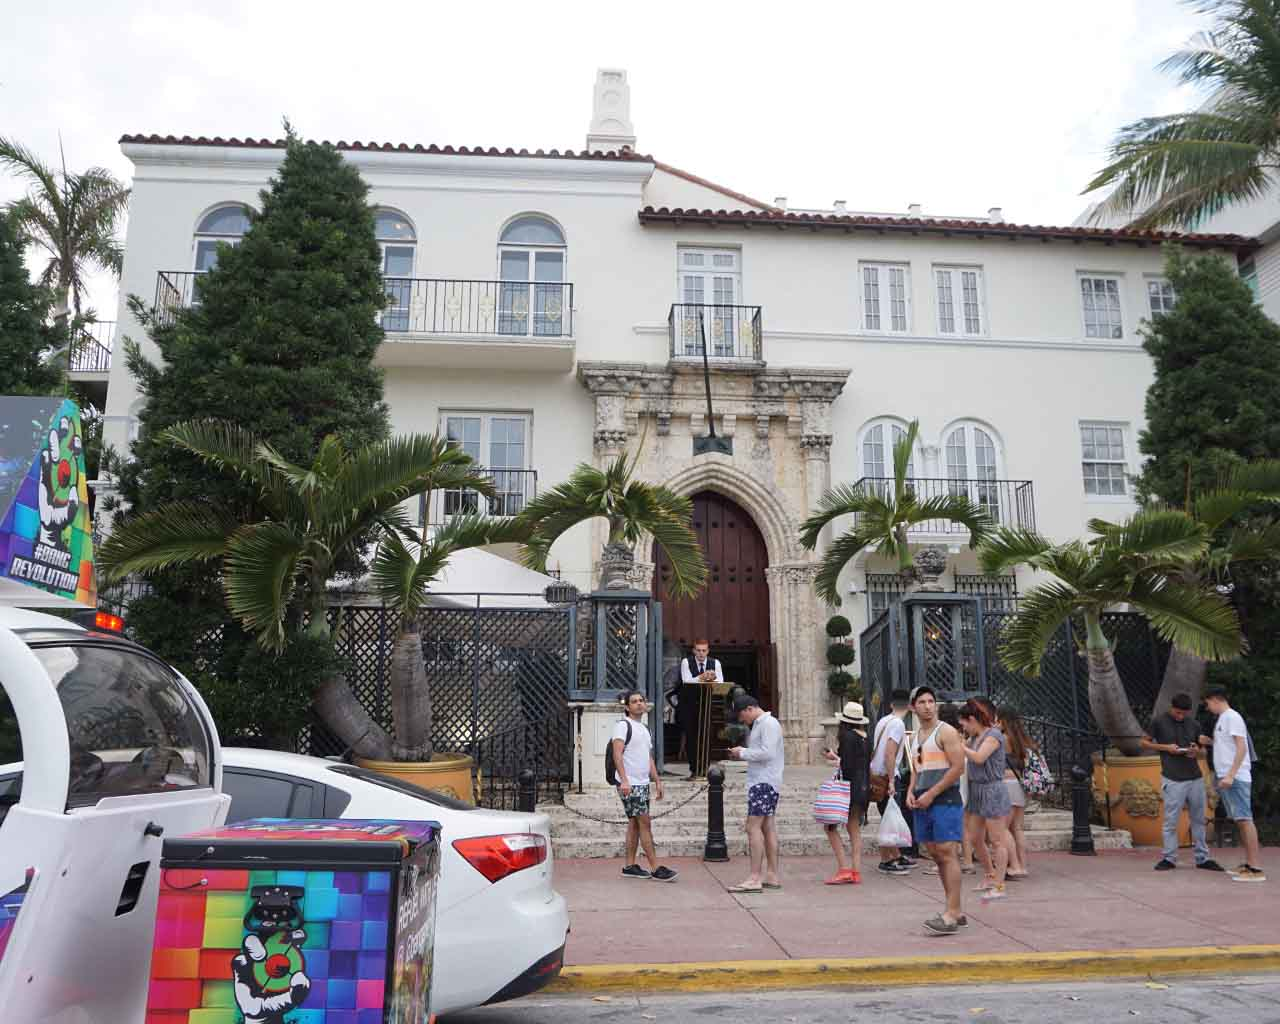 Casa Casuarina - das ehemalige Wohnhaus von Versace (Ocean Drive 1116, Miami Beach)